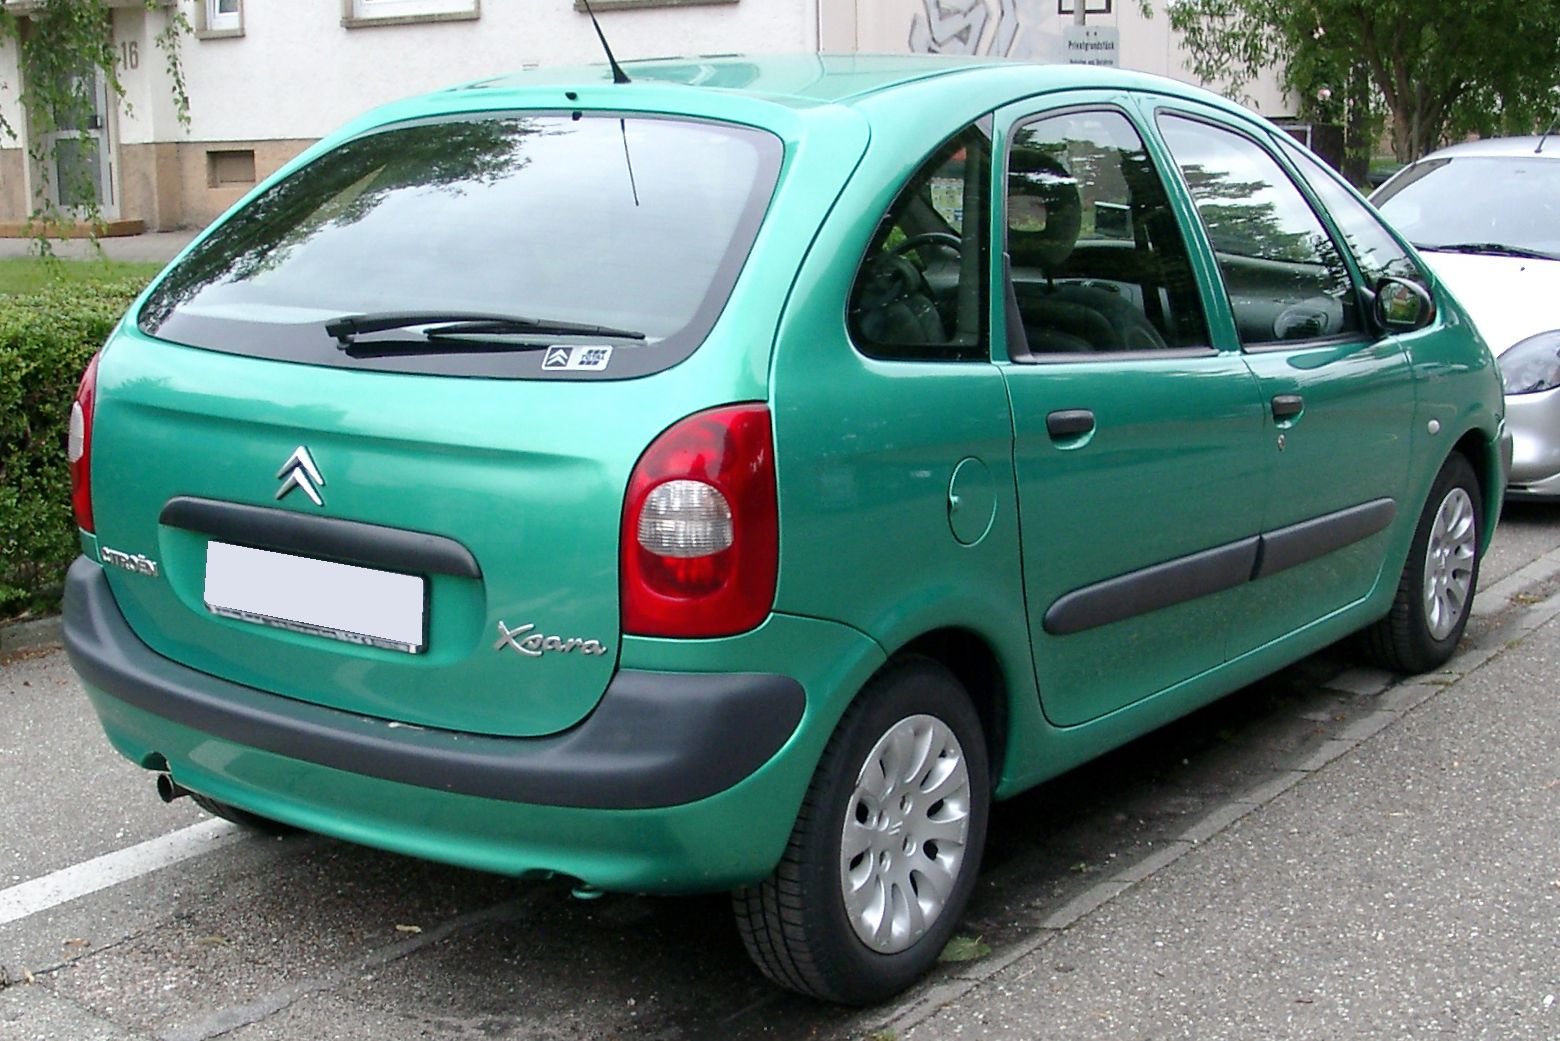 CITROEN XSARA PICASSO green